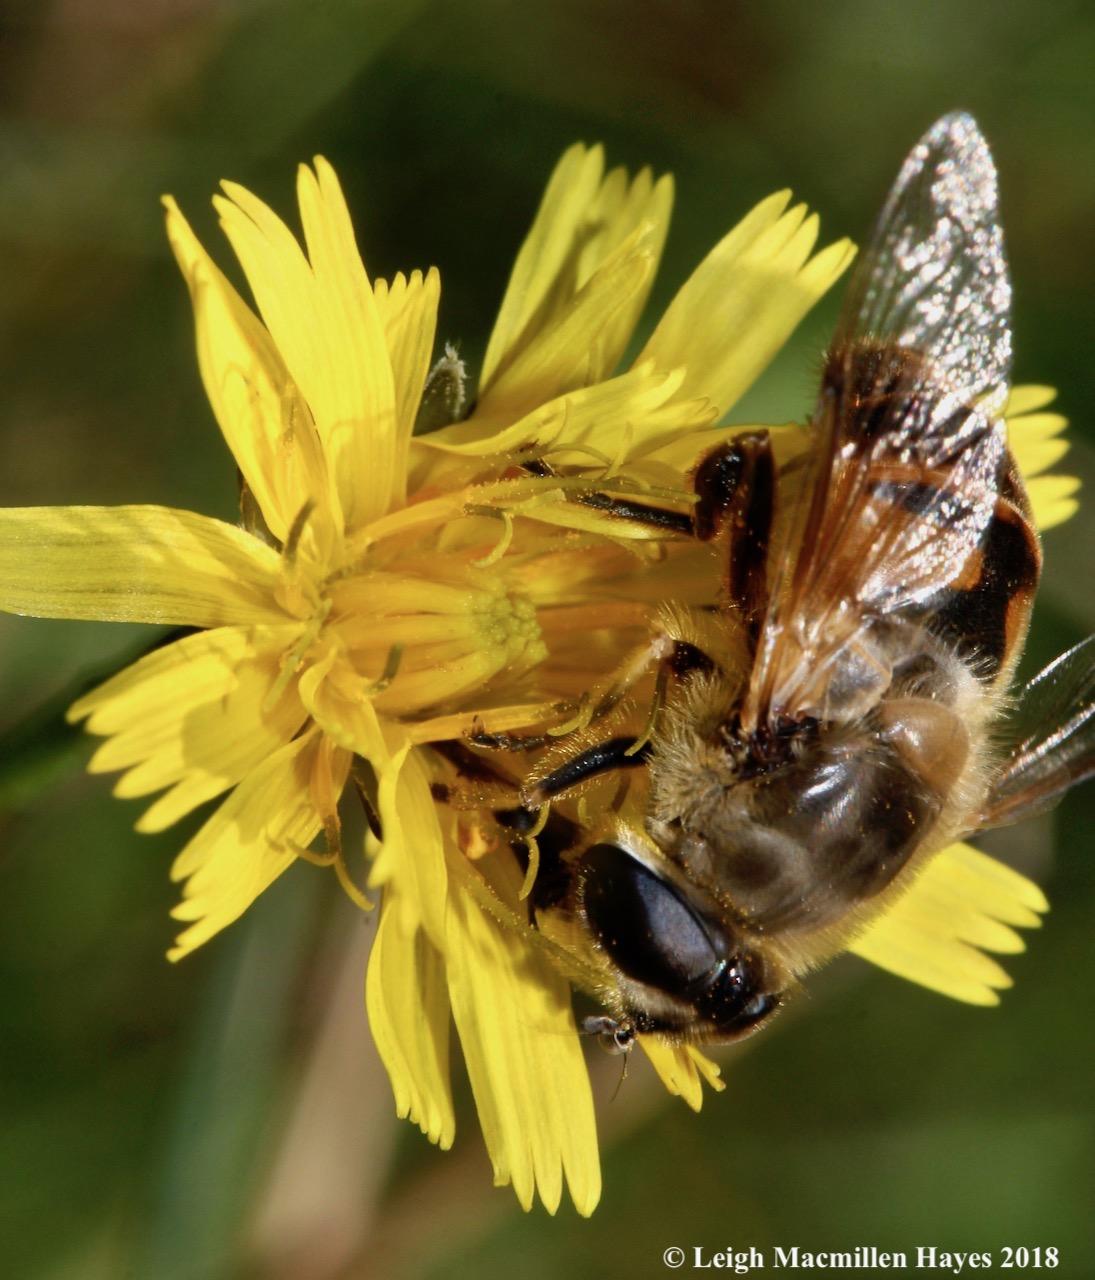 20-drone fly, looks like a European honey bee